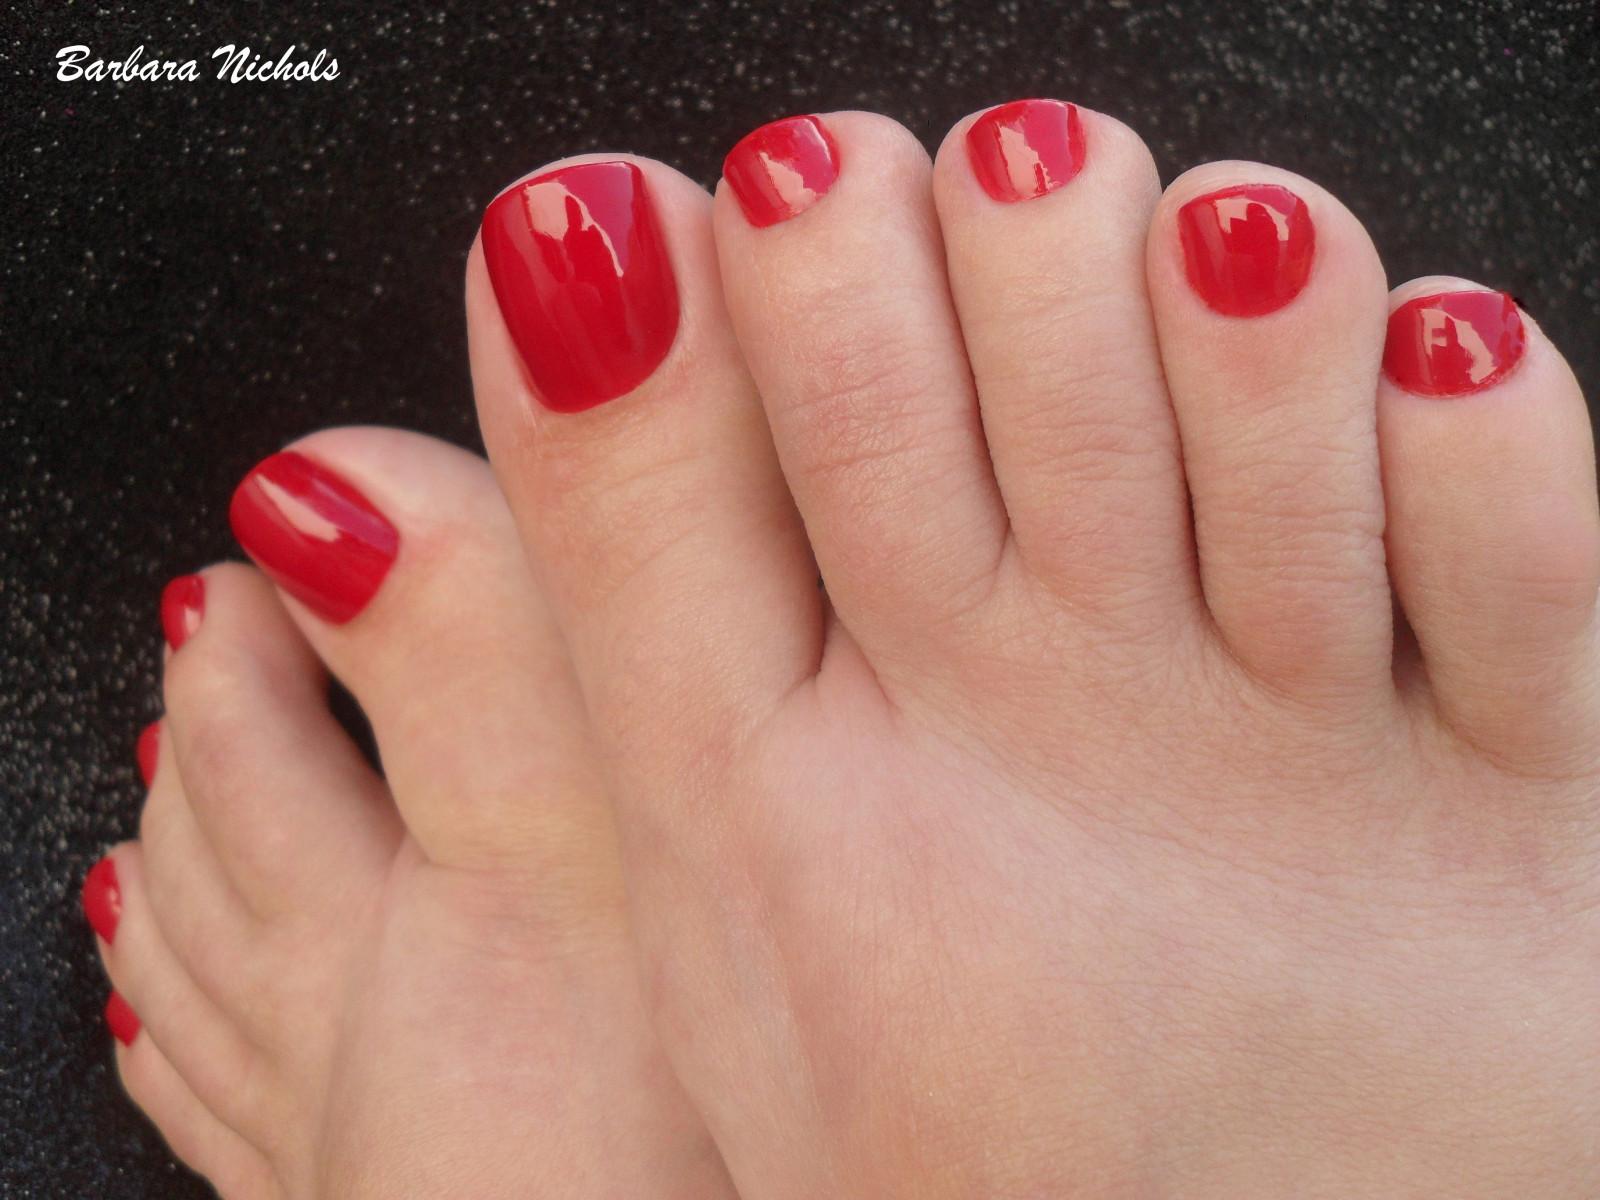 Wallpaper : red, feet, nails, foot, finger, shoe, toe, manicure ...